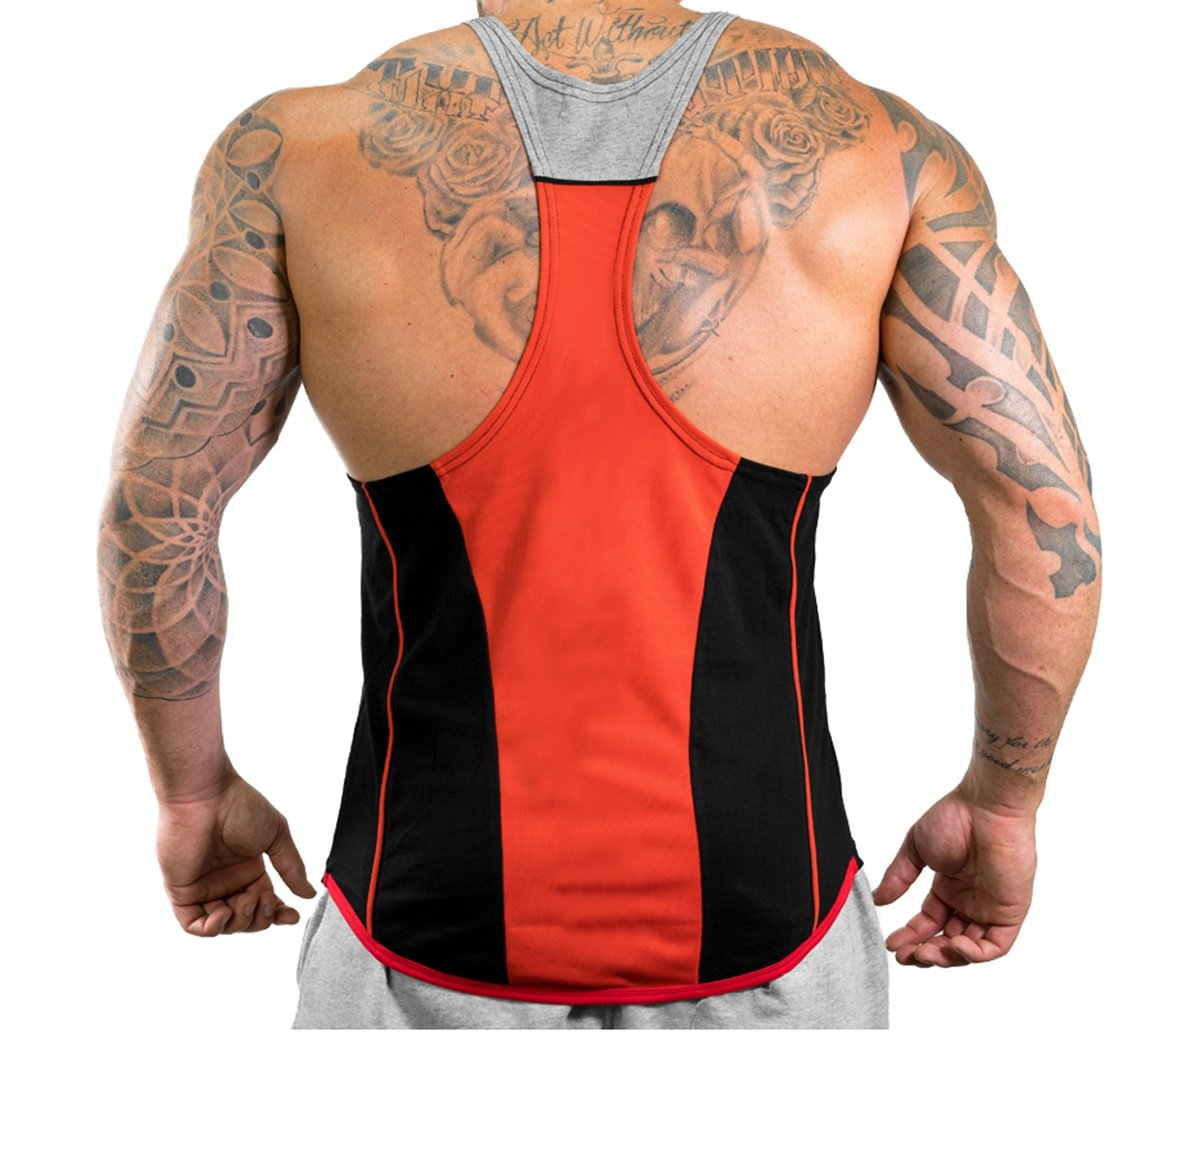 6ad25e8eb57ff Harri me Men s Muscle Gym Fitness Y Back Stringer Tank Tops ...